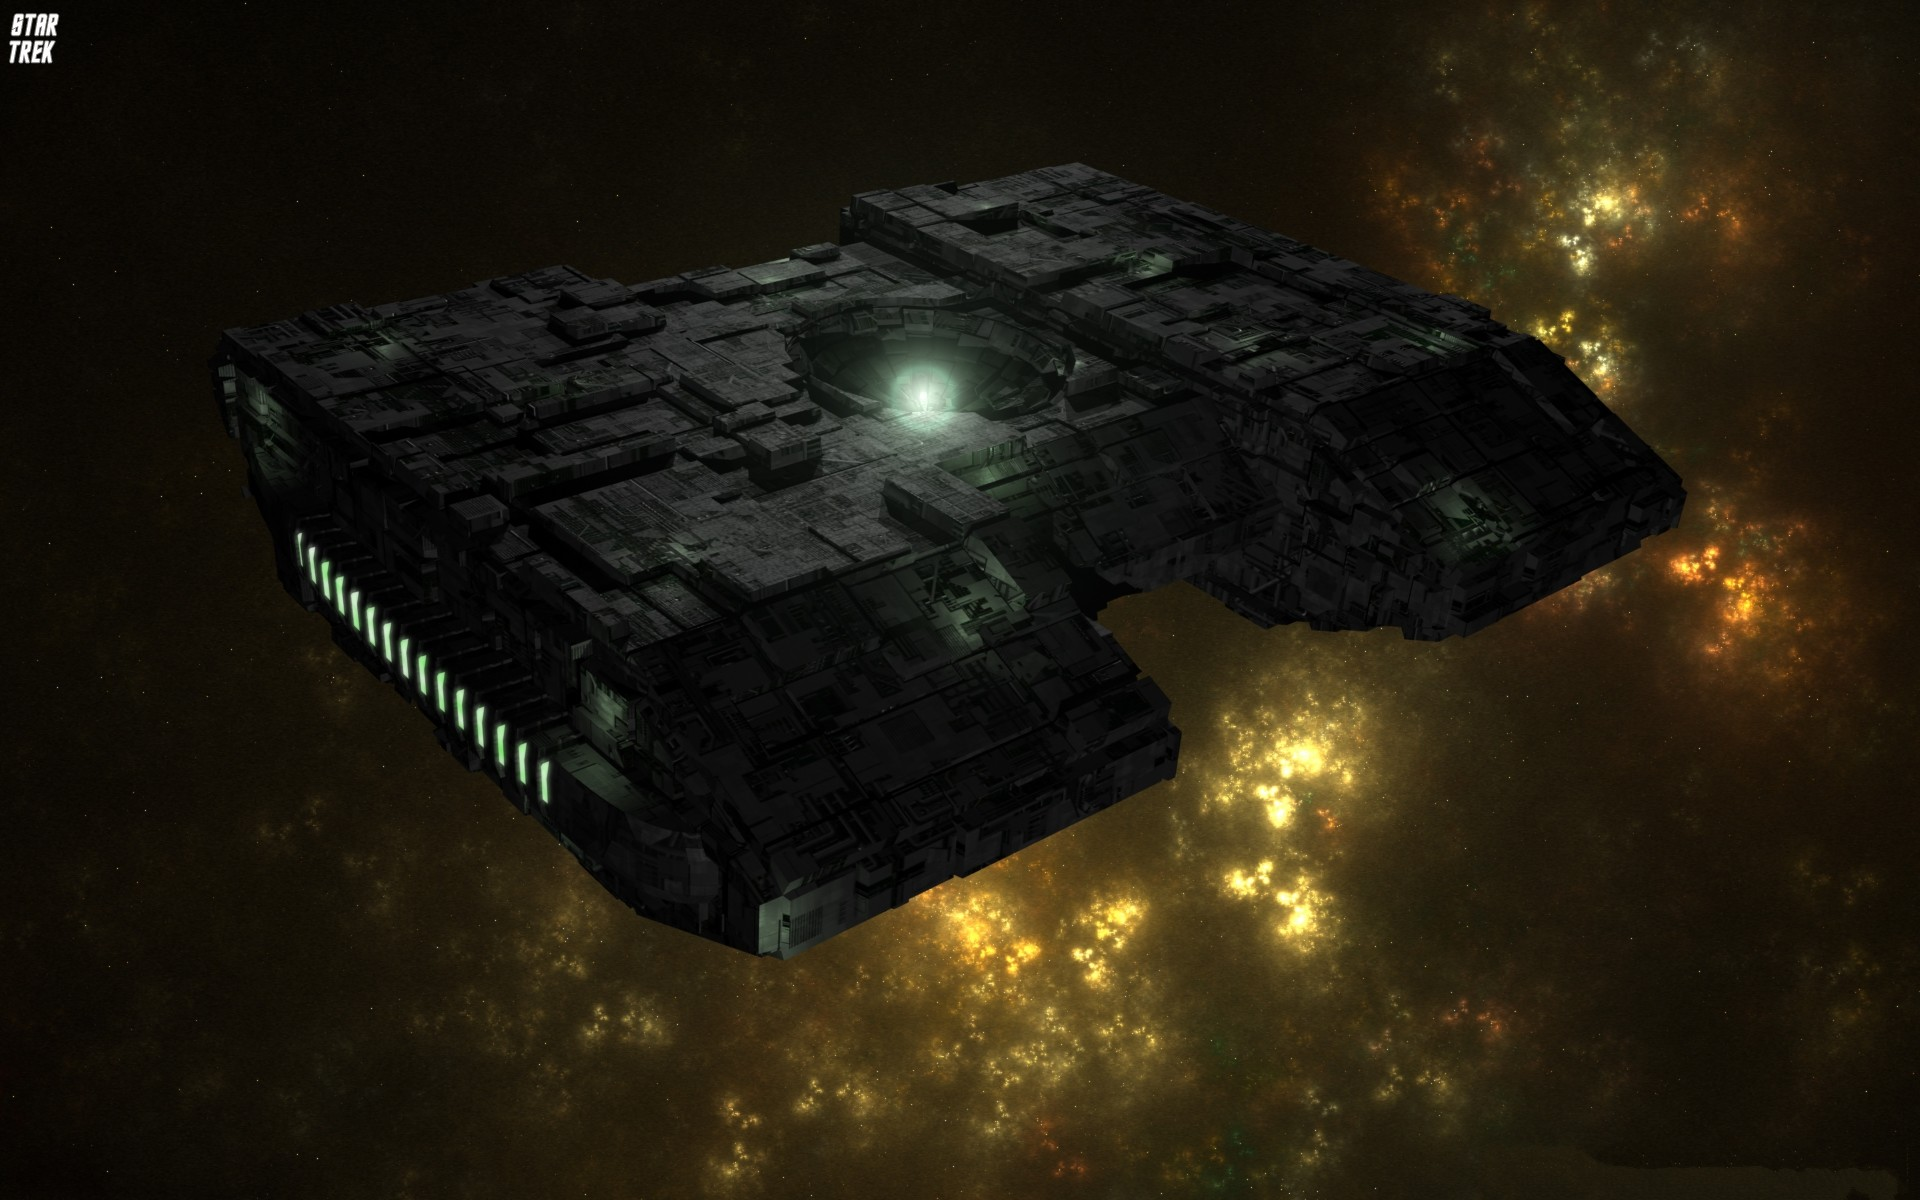 Borg Star Trek HD Wallpaper.